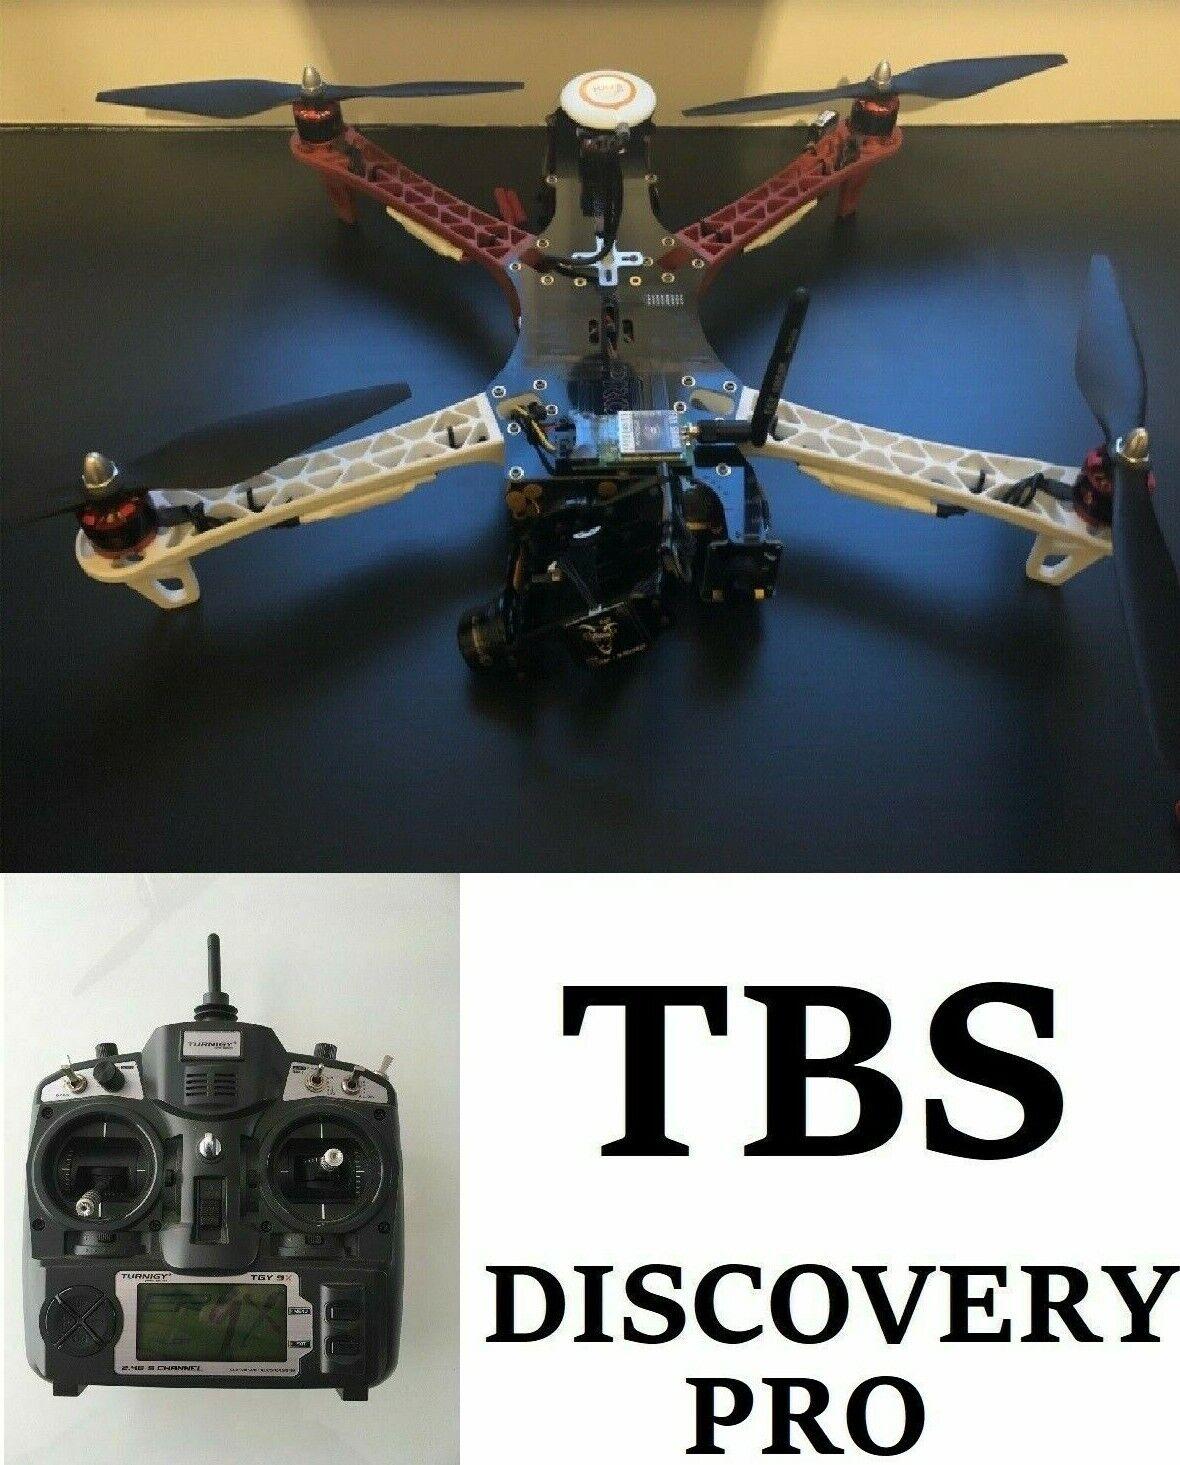 Descubrimiento TBS DJI Naza V2 Pro RC Cuadricóptero FPV Turnigy 9X FrSky Fatshark Drone